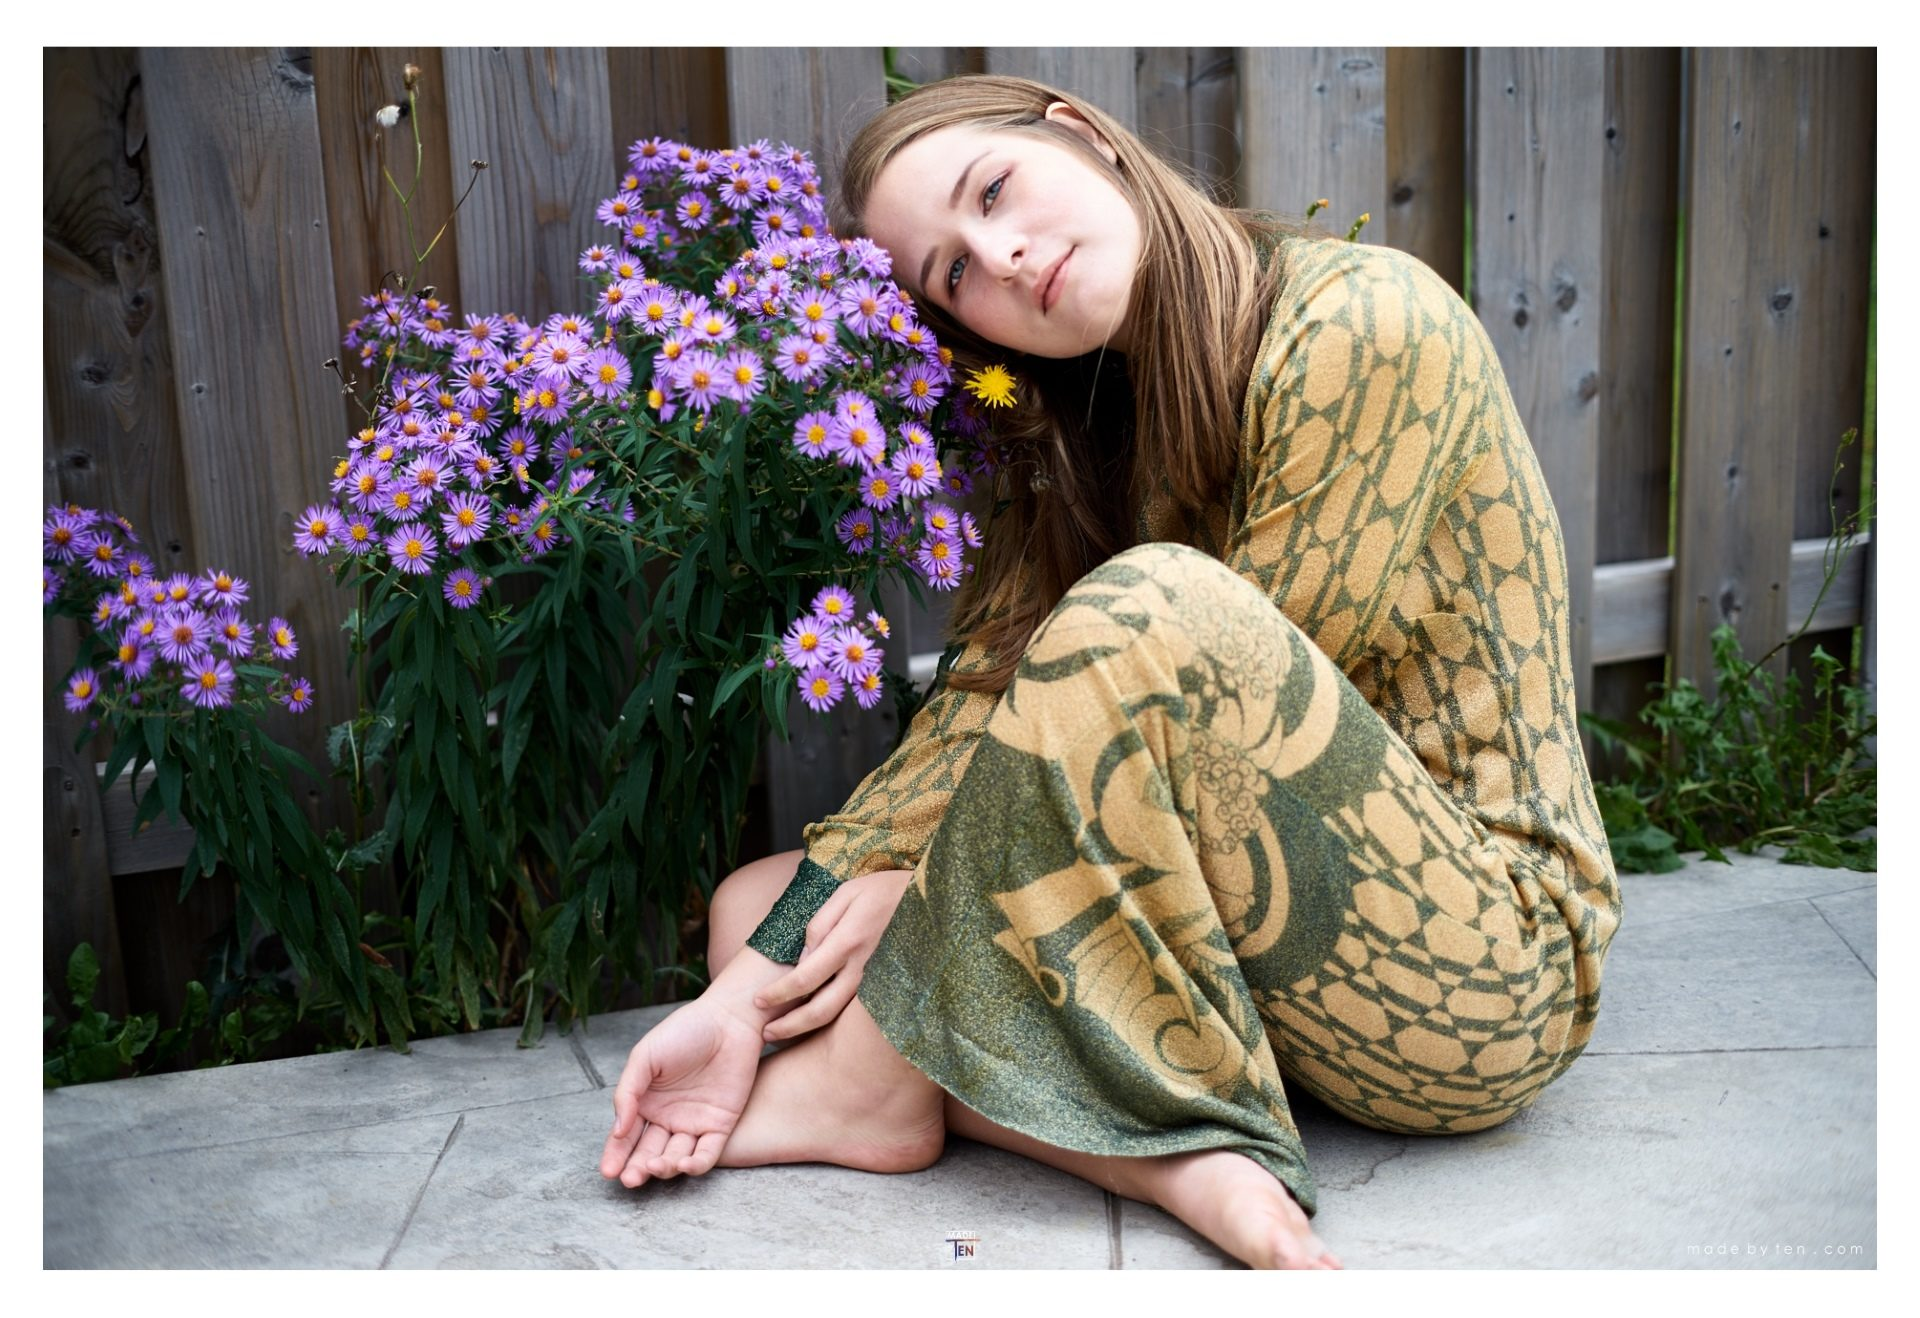 Dress with Purple Flowers - GTA Women Art Photography